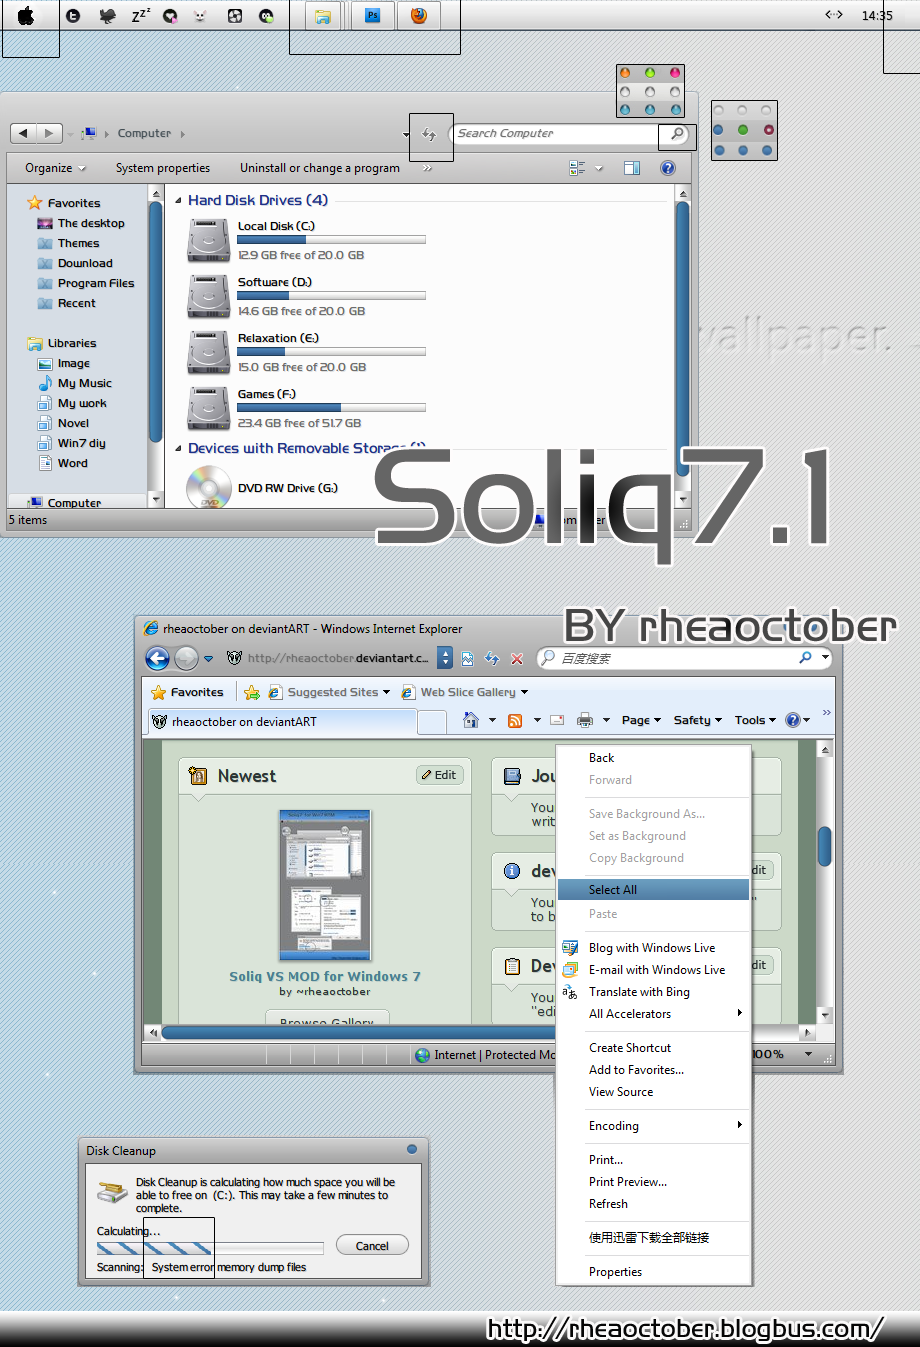 Soliq7.1 VS for WIN7 RTM by rheaoctober